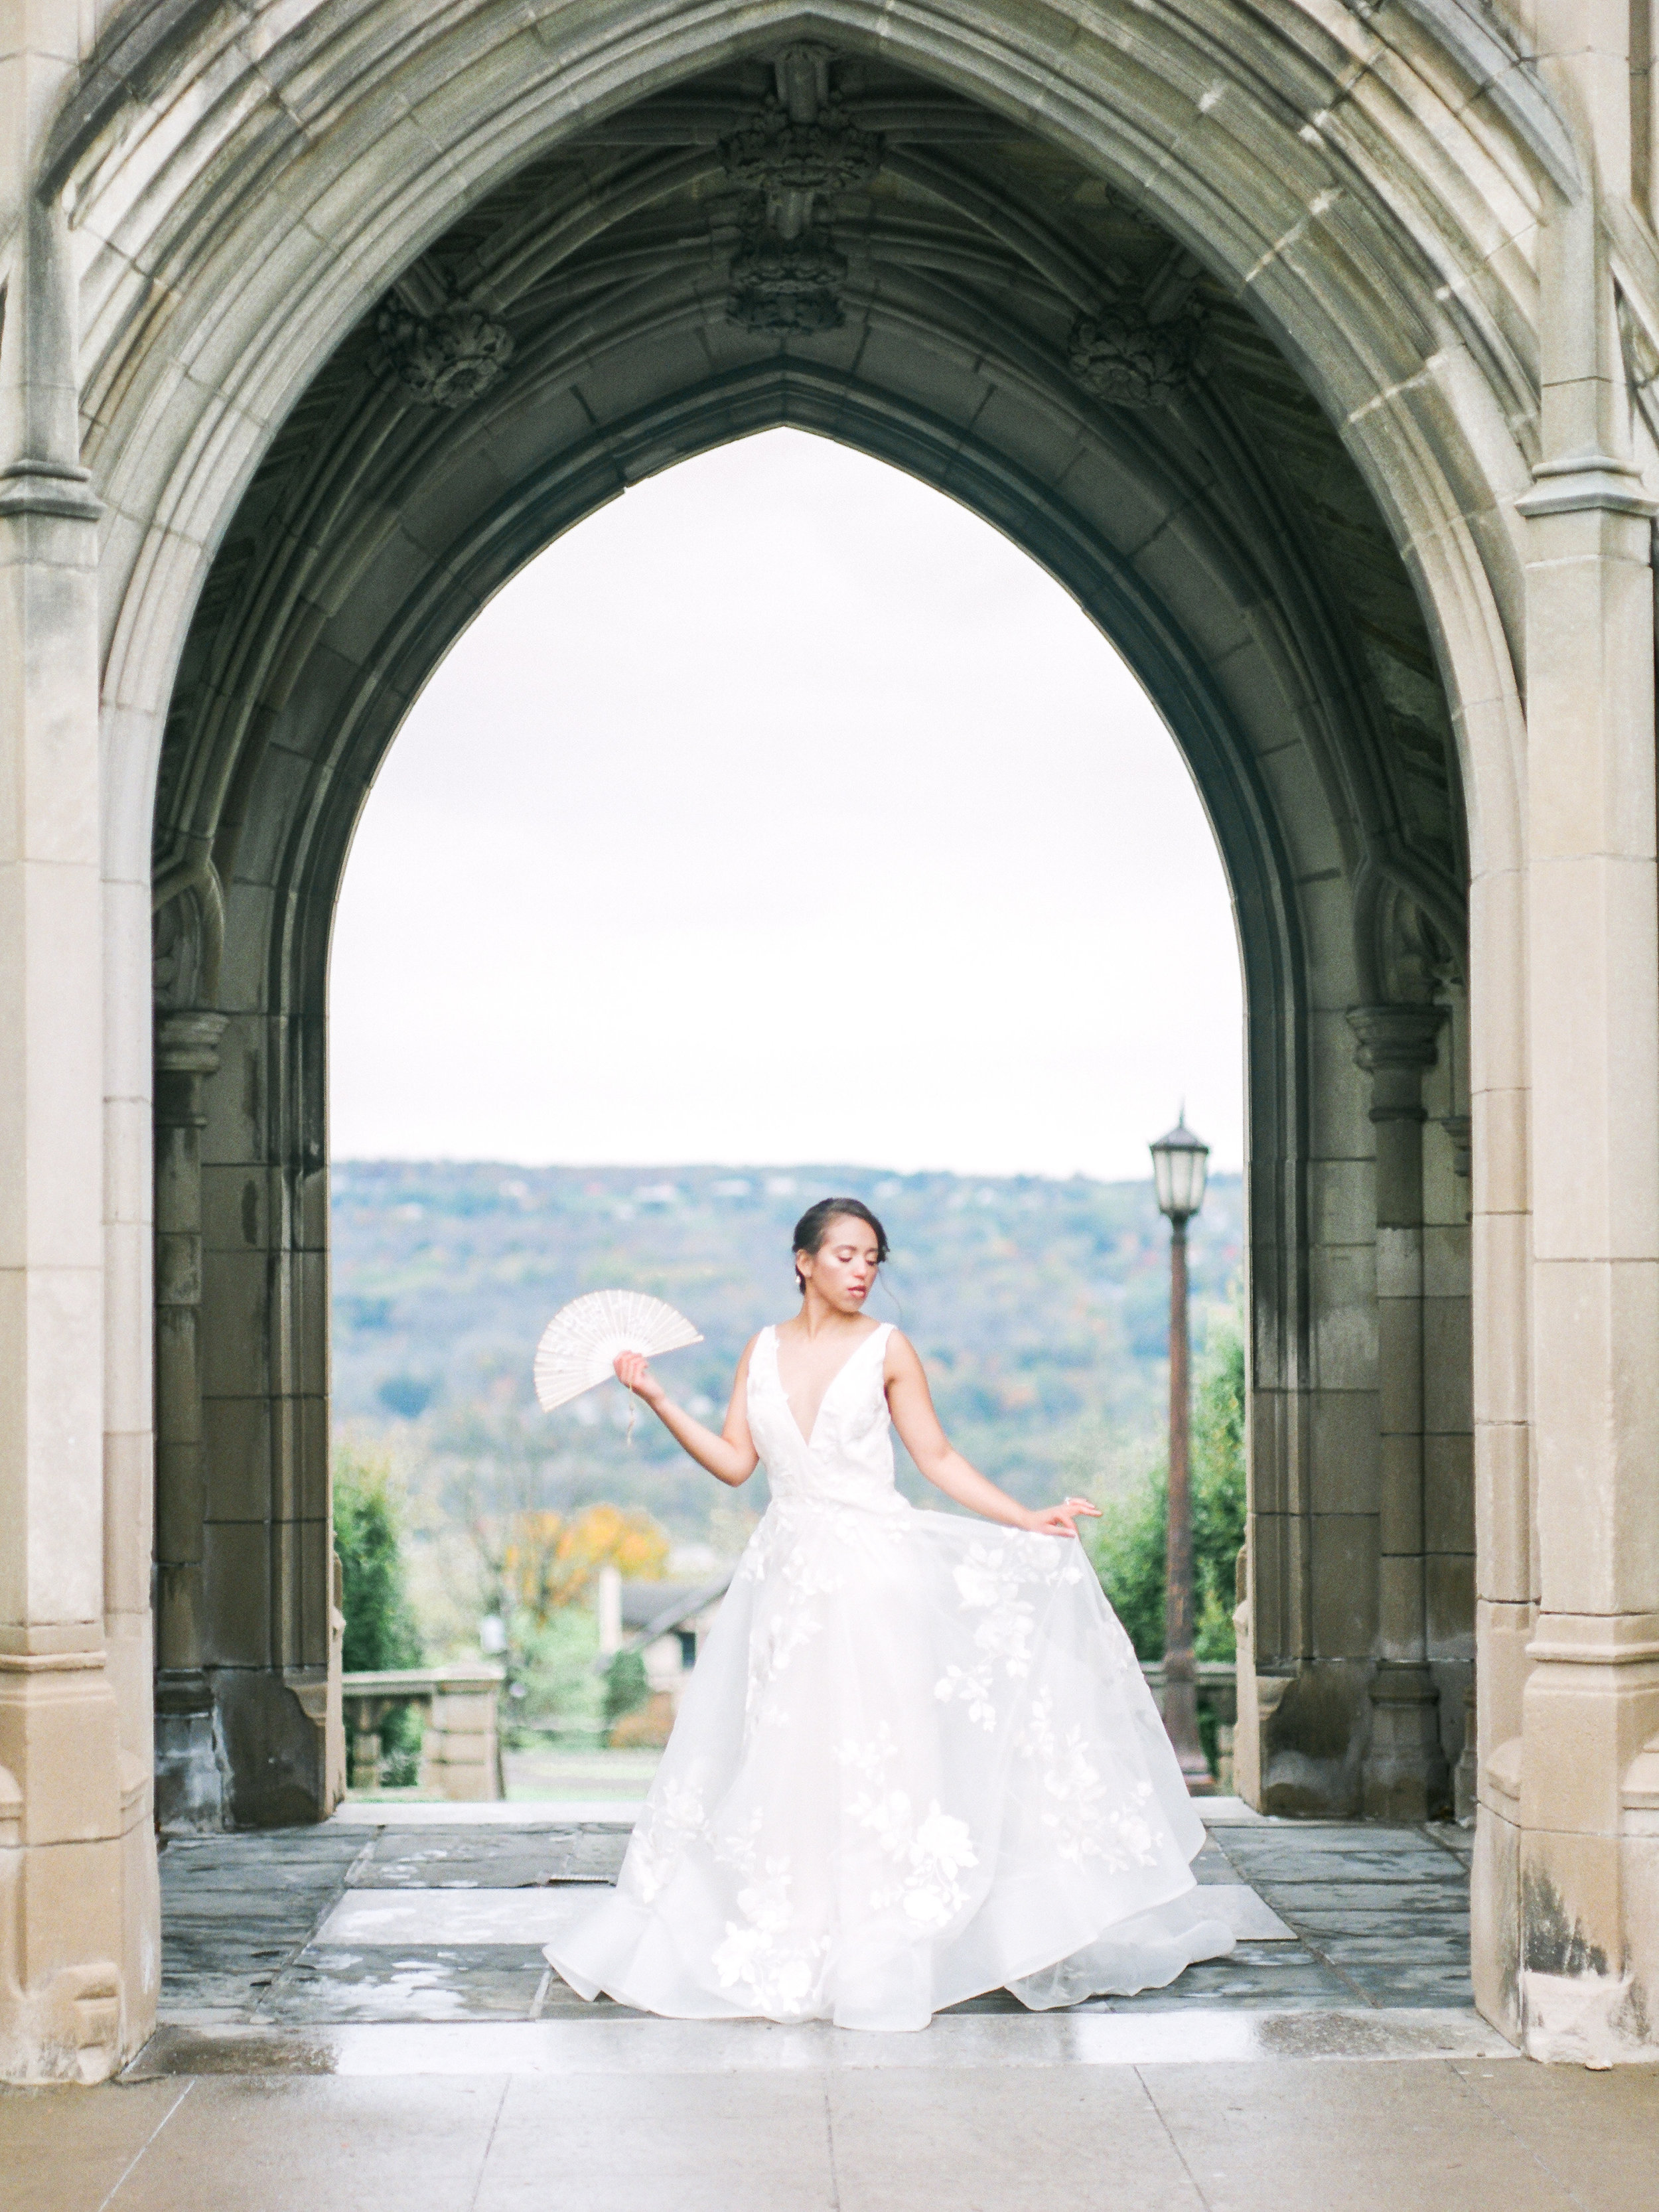 Ithaca New York-Brides Story-Manda Weaver-Wedding-14.jpg